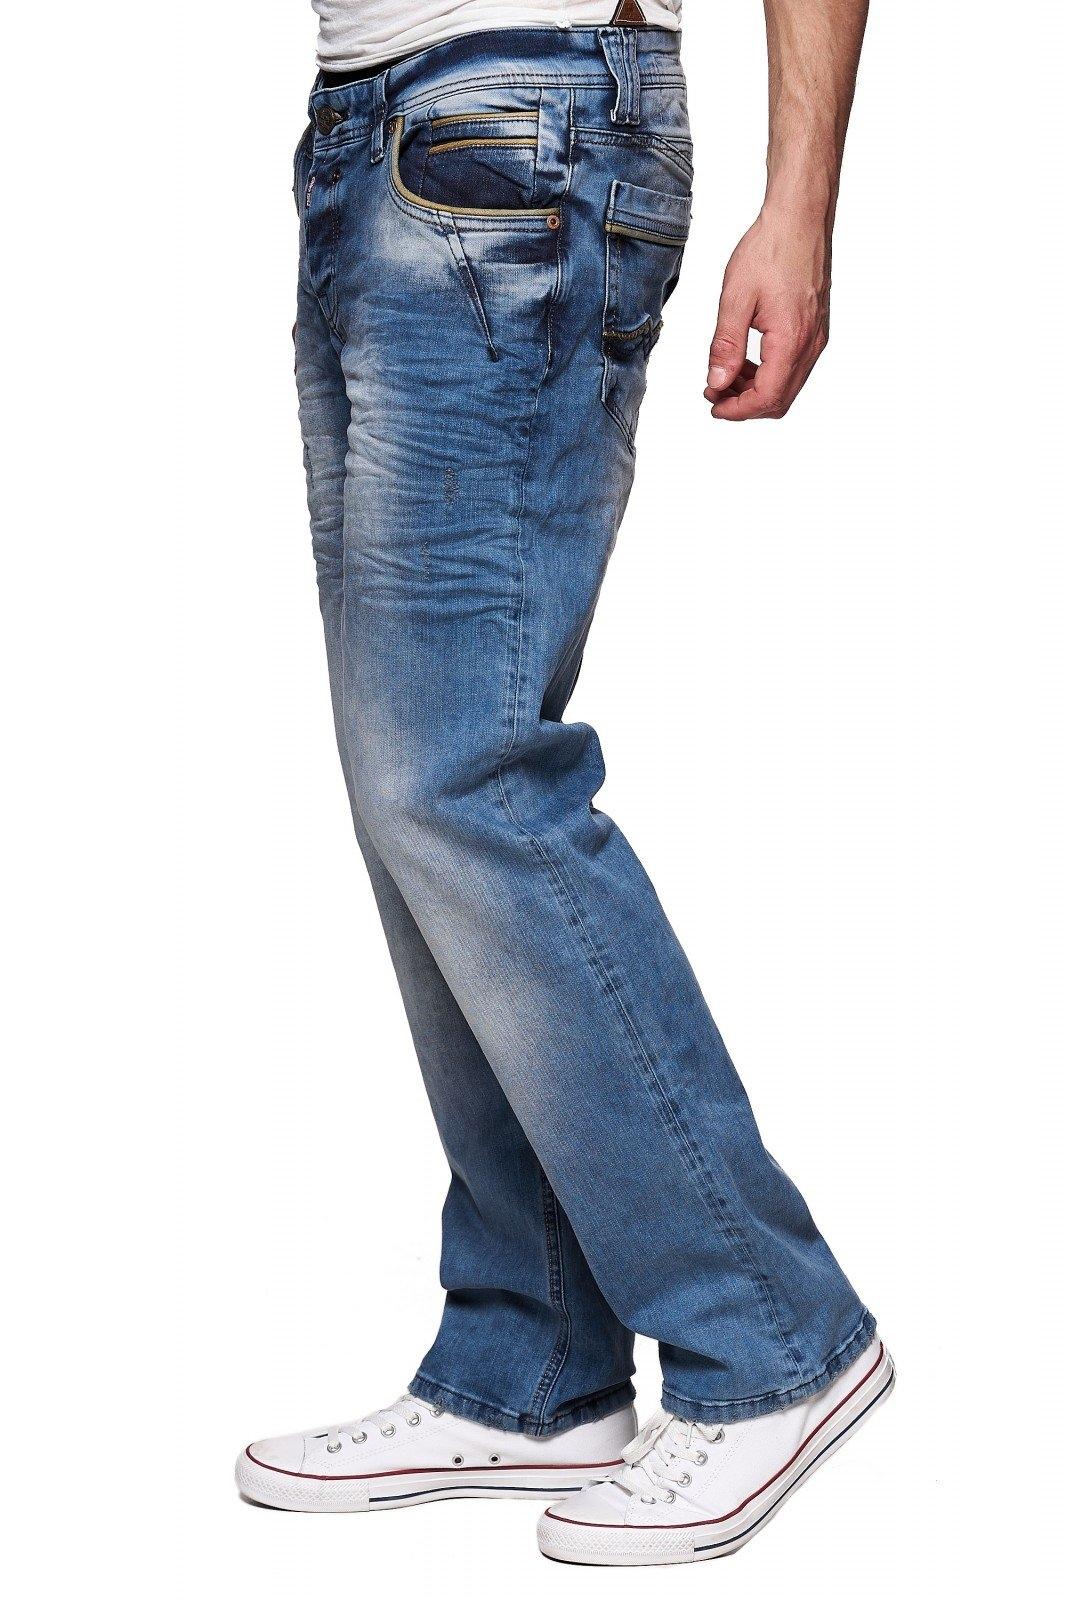 Nu Neal Rusty Rusty JeansBestel Bij UzMLpqSVG